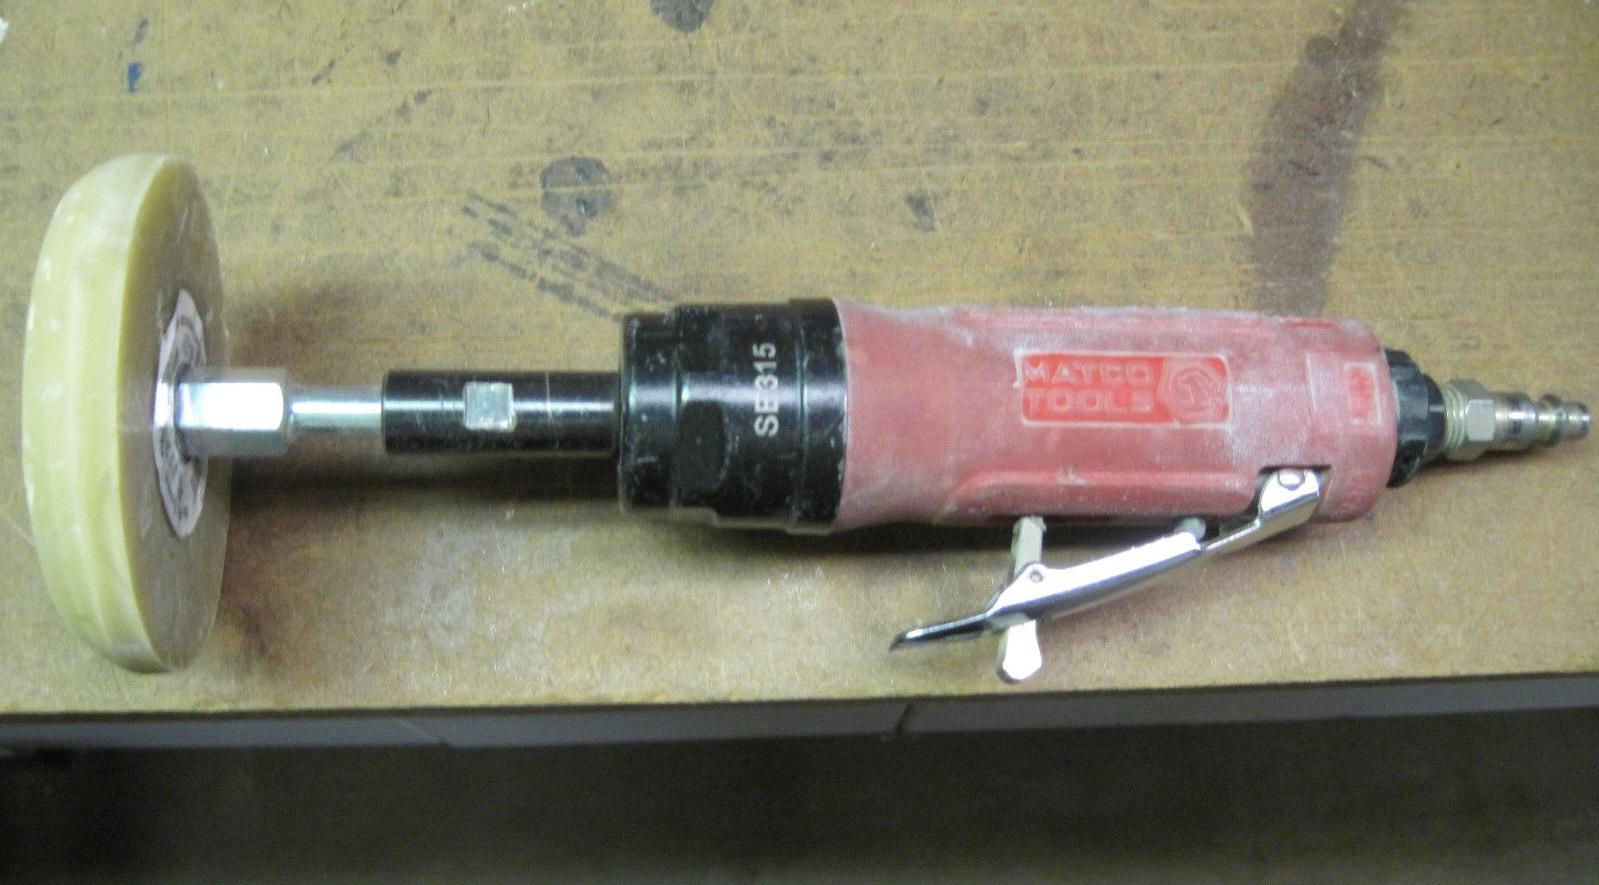 MATCO Tools SE315